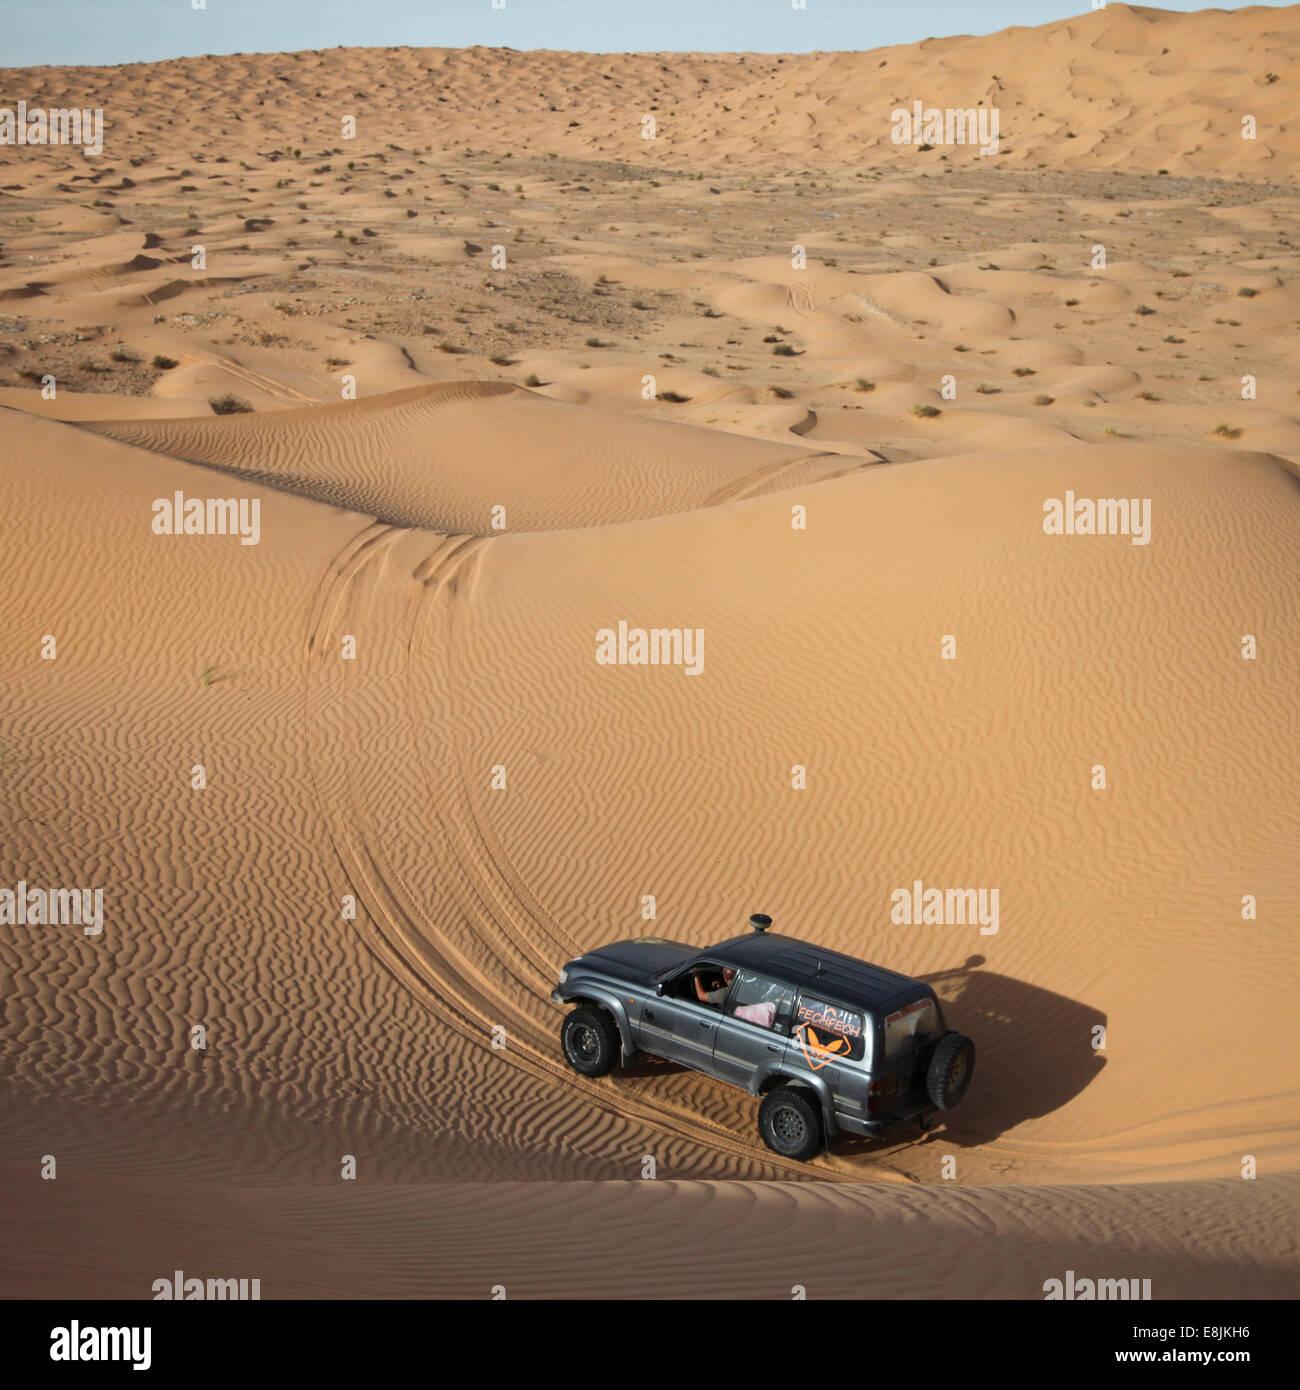 Vehicle in the Sahara - Stock Image